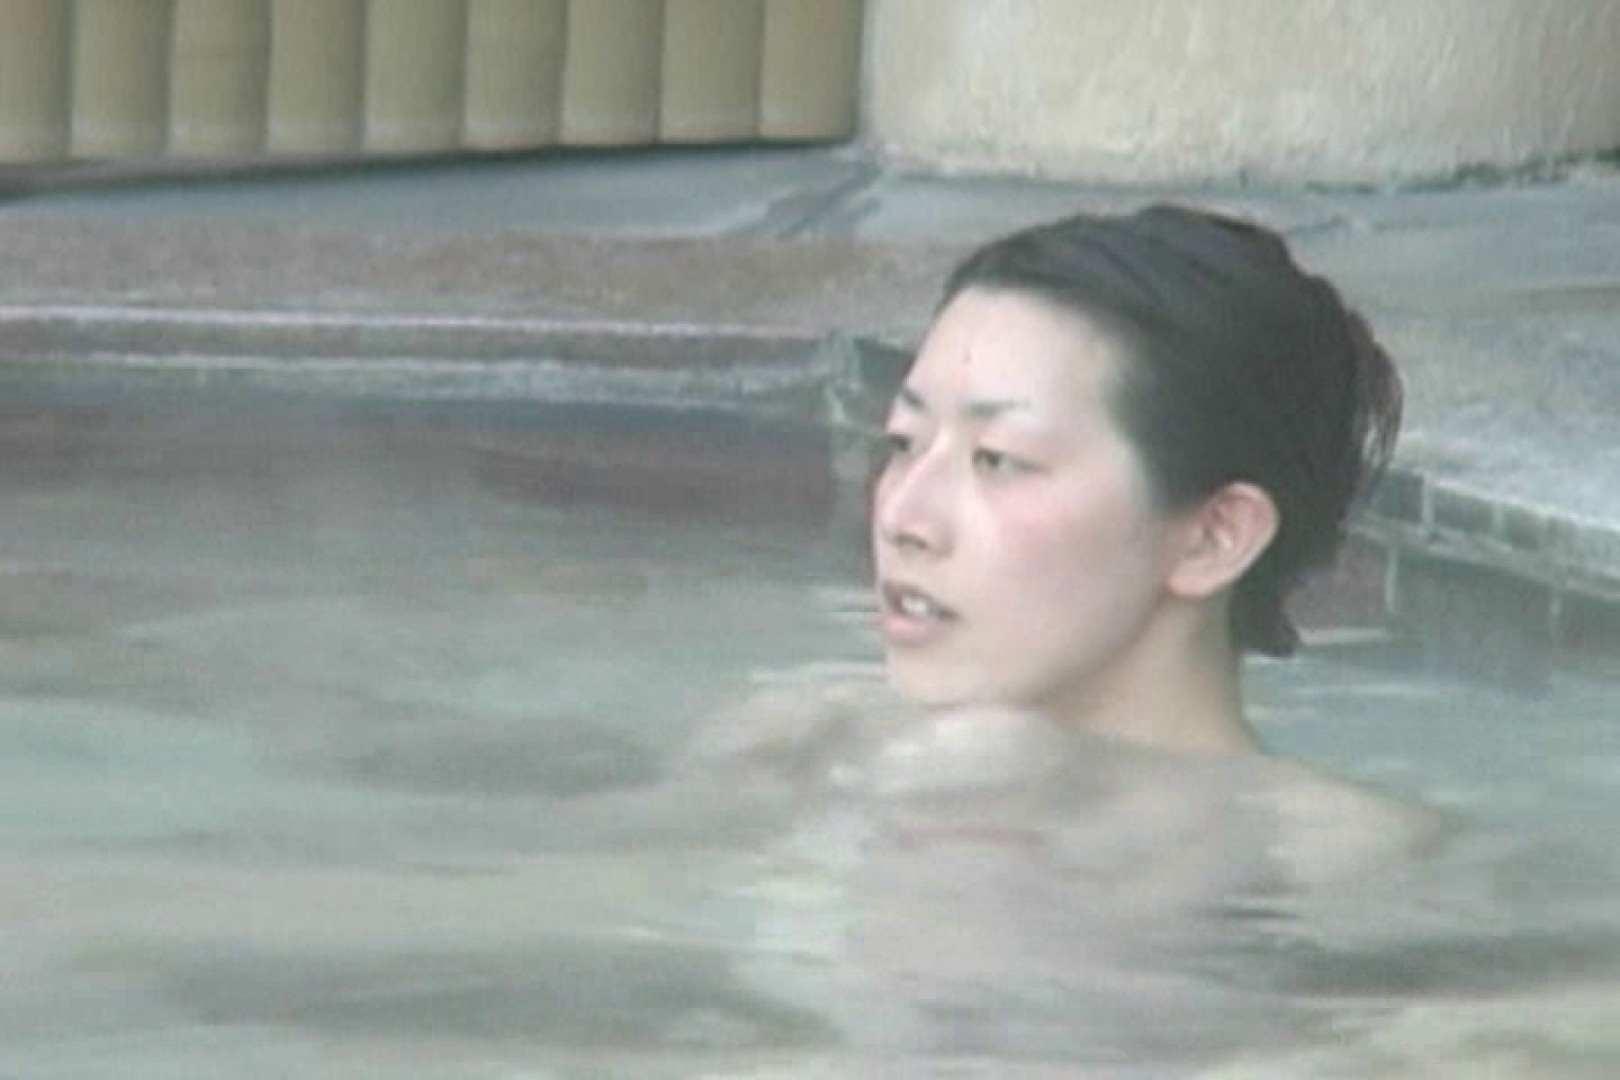 Aquaな露天風呂Vol.589 盗撮 | HなOL  105pic 2